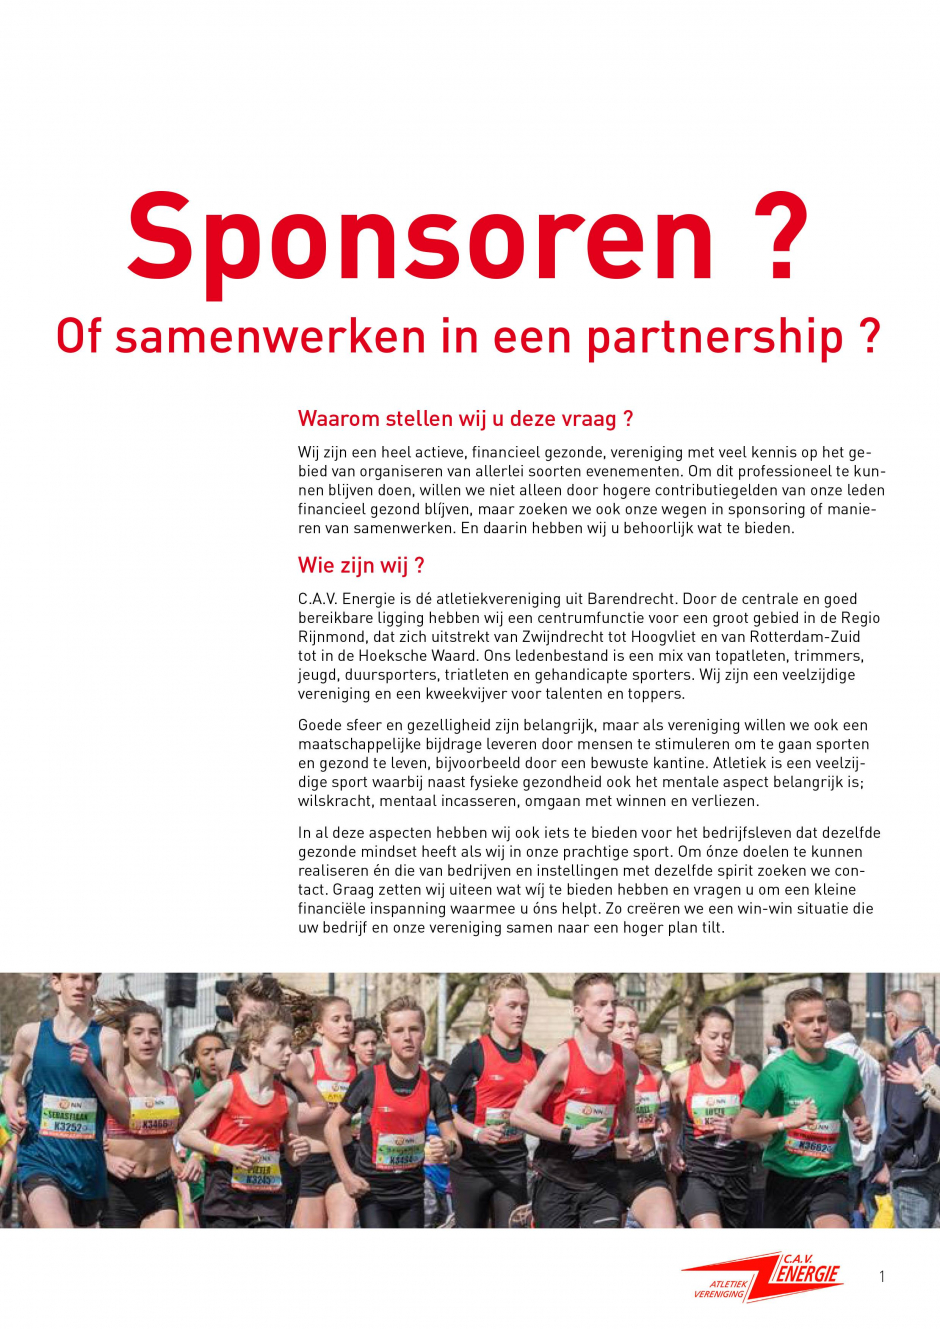 sponsoren_en_samenwerken_pagina_1_2.jpg